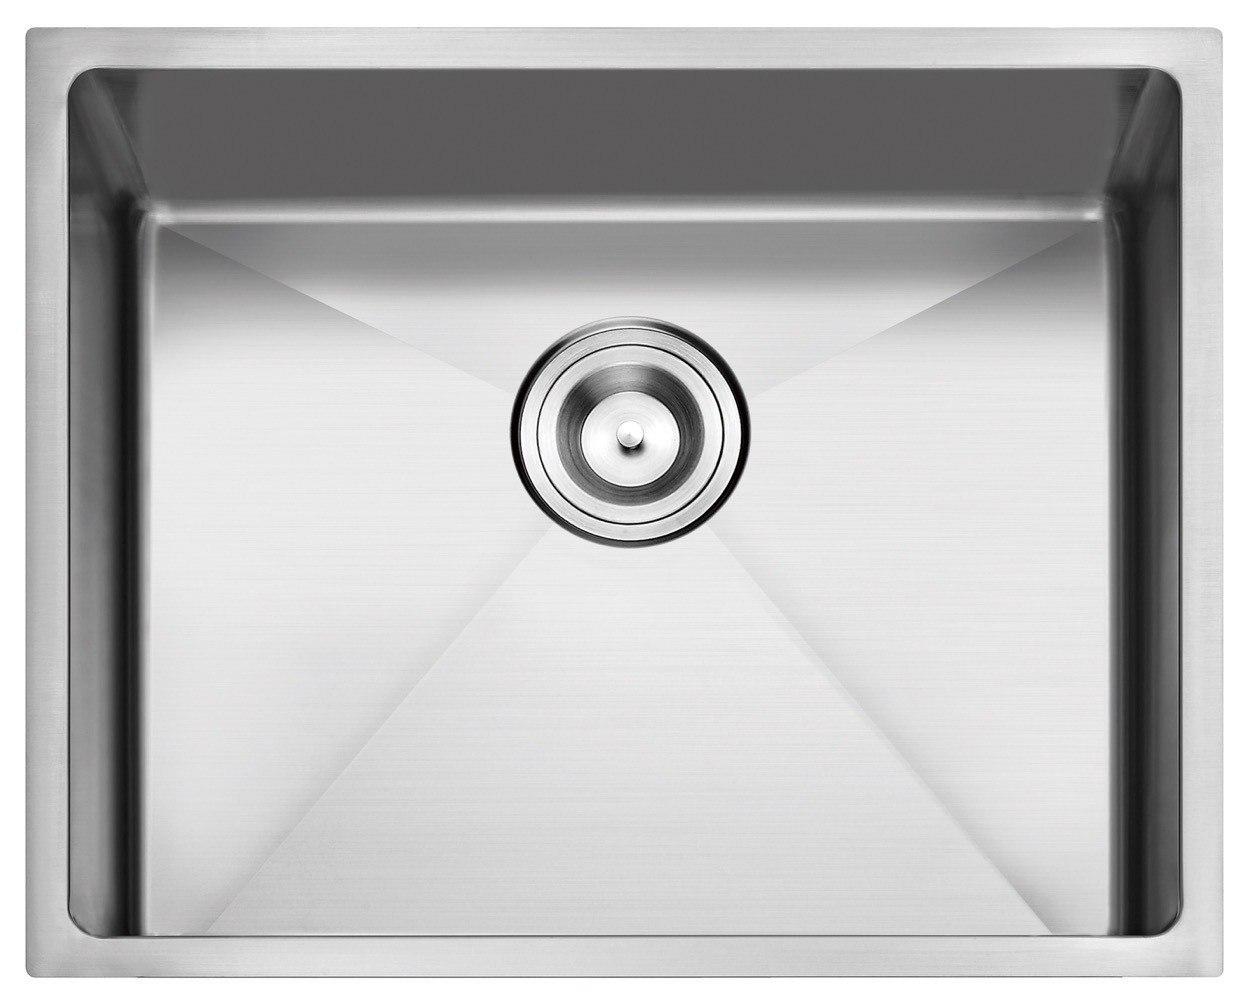 Stufurhome Nw 2318s 18 Nationalware 18 Gauge Stainless Steel 23 Inch Single Basin Undermount Kitchen Sink